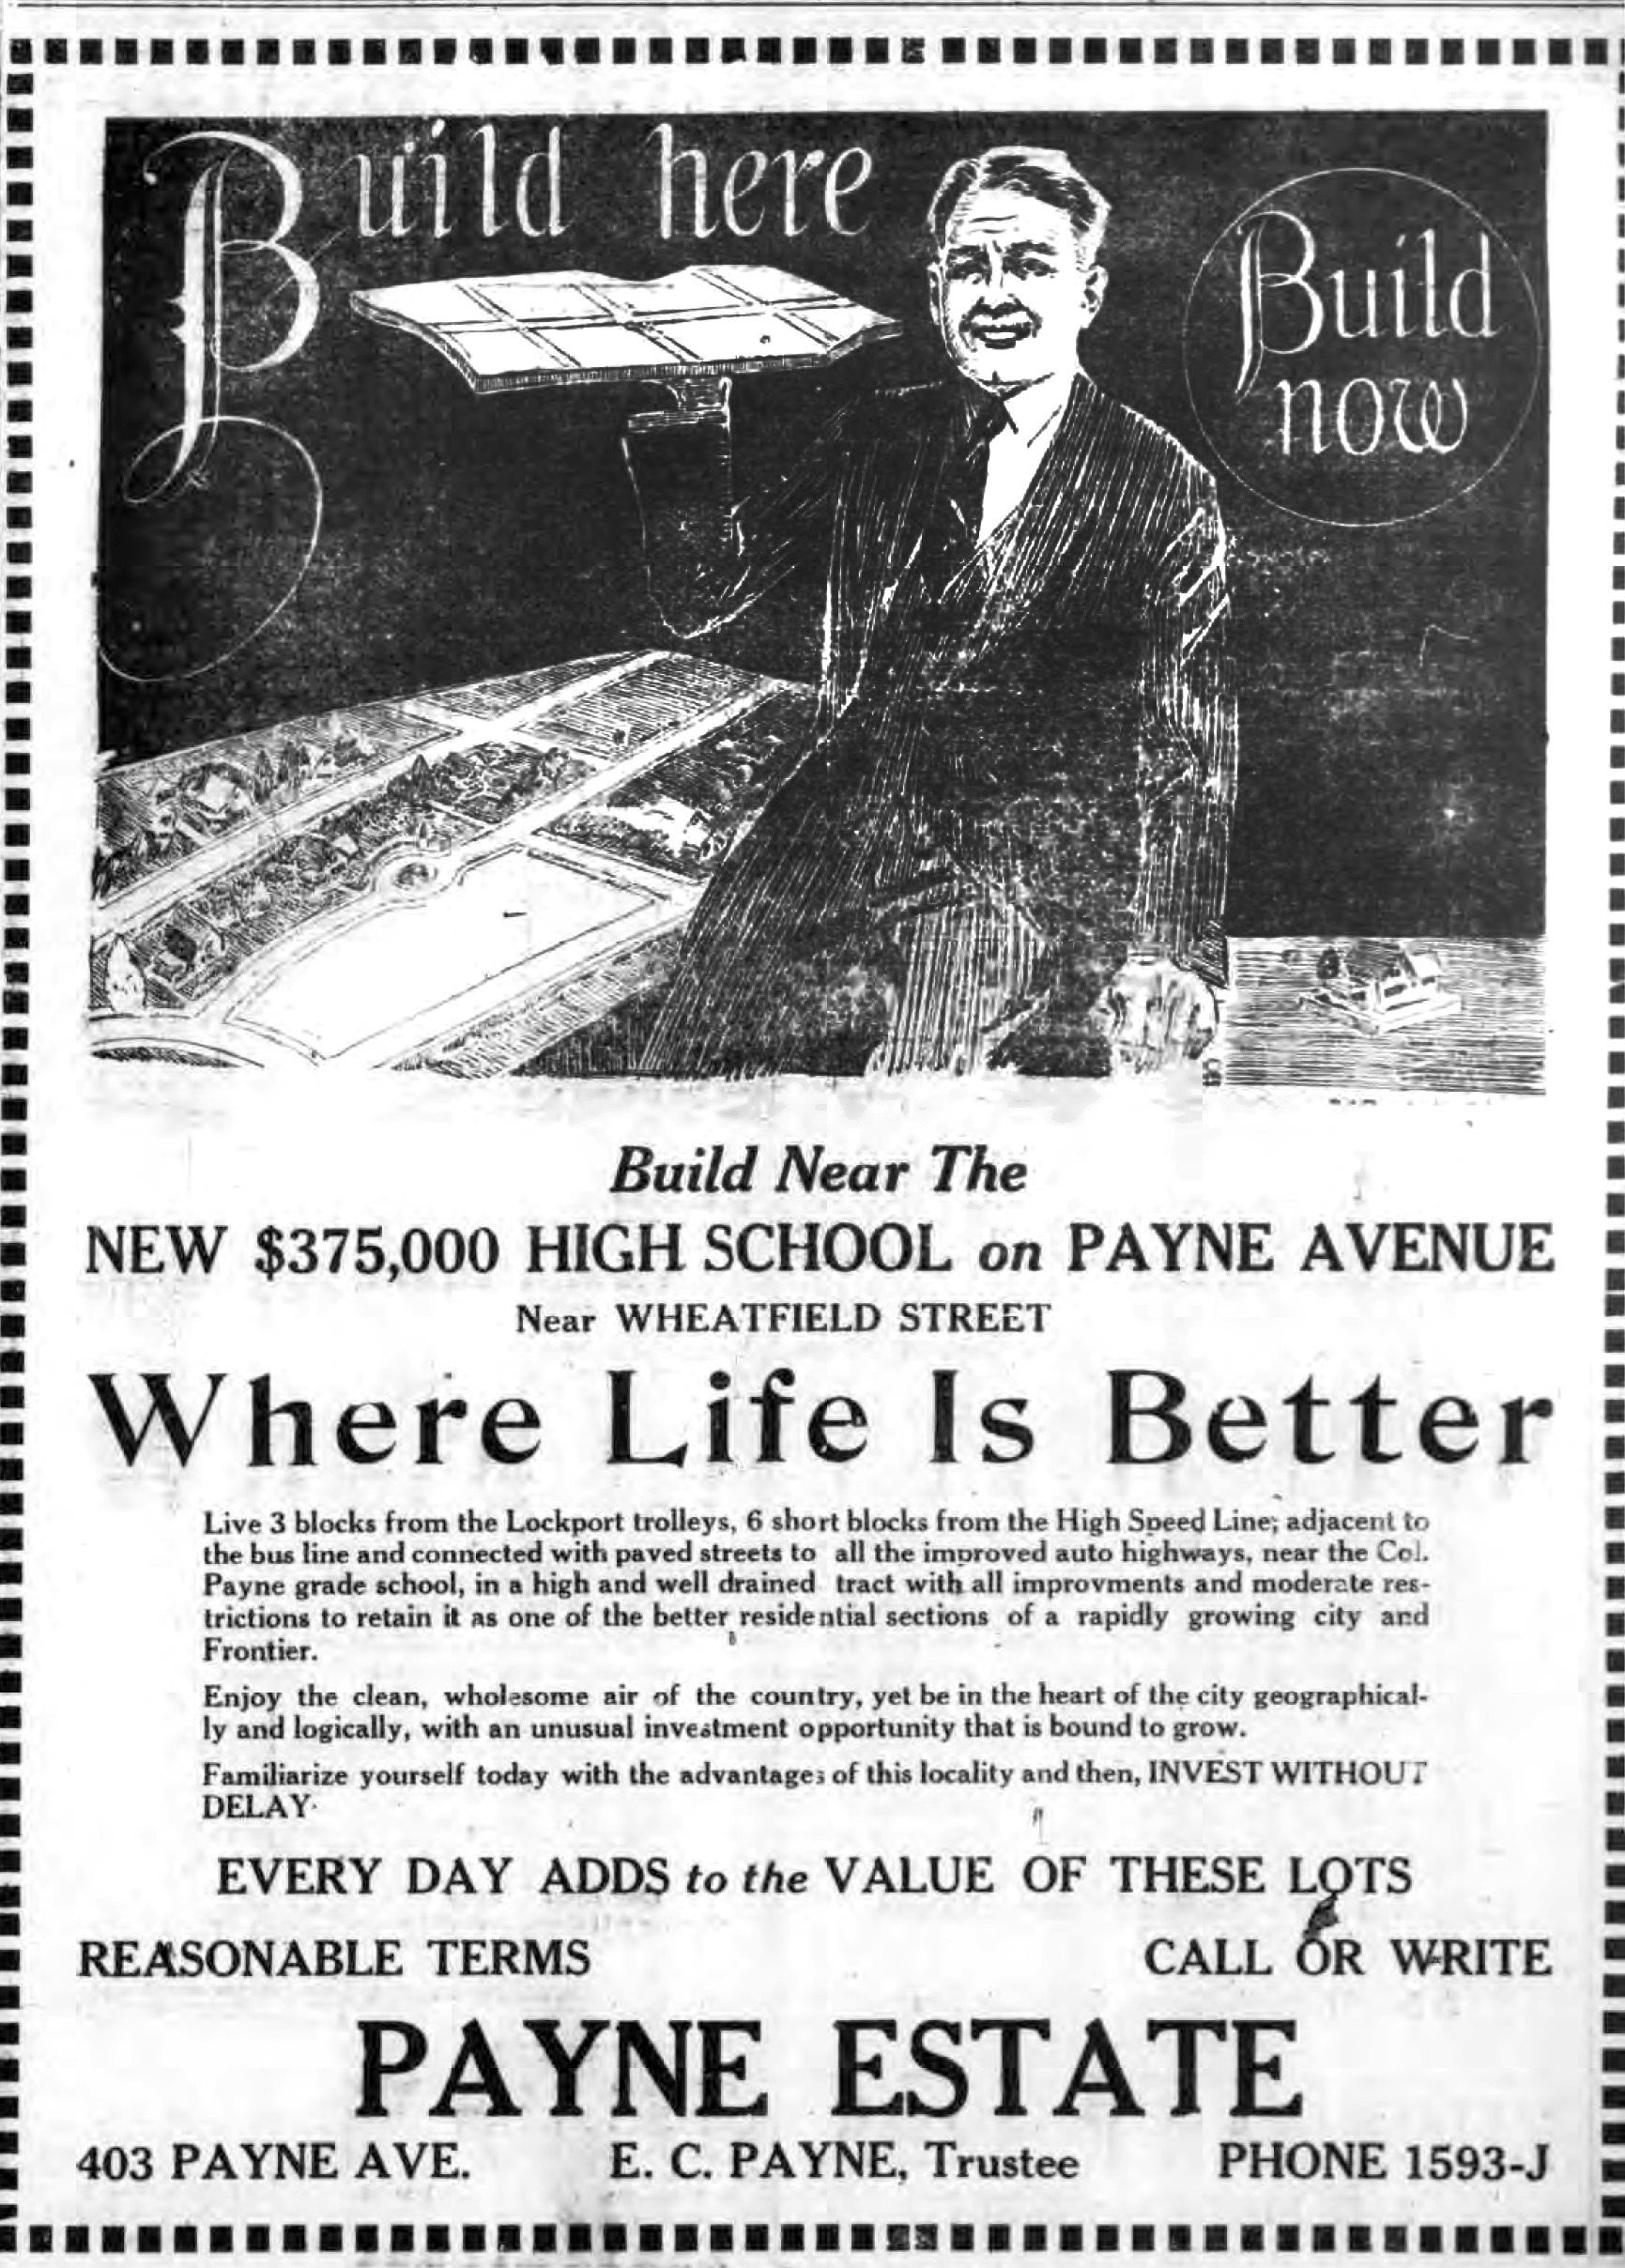 Build Here, Whee Life Is Better, Payne Estate, illustrated ad (Tonawanda News, 1924-07-12.jpg